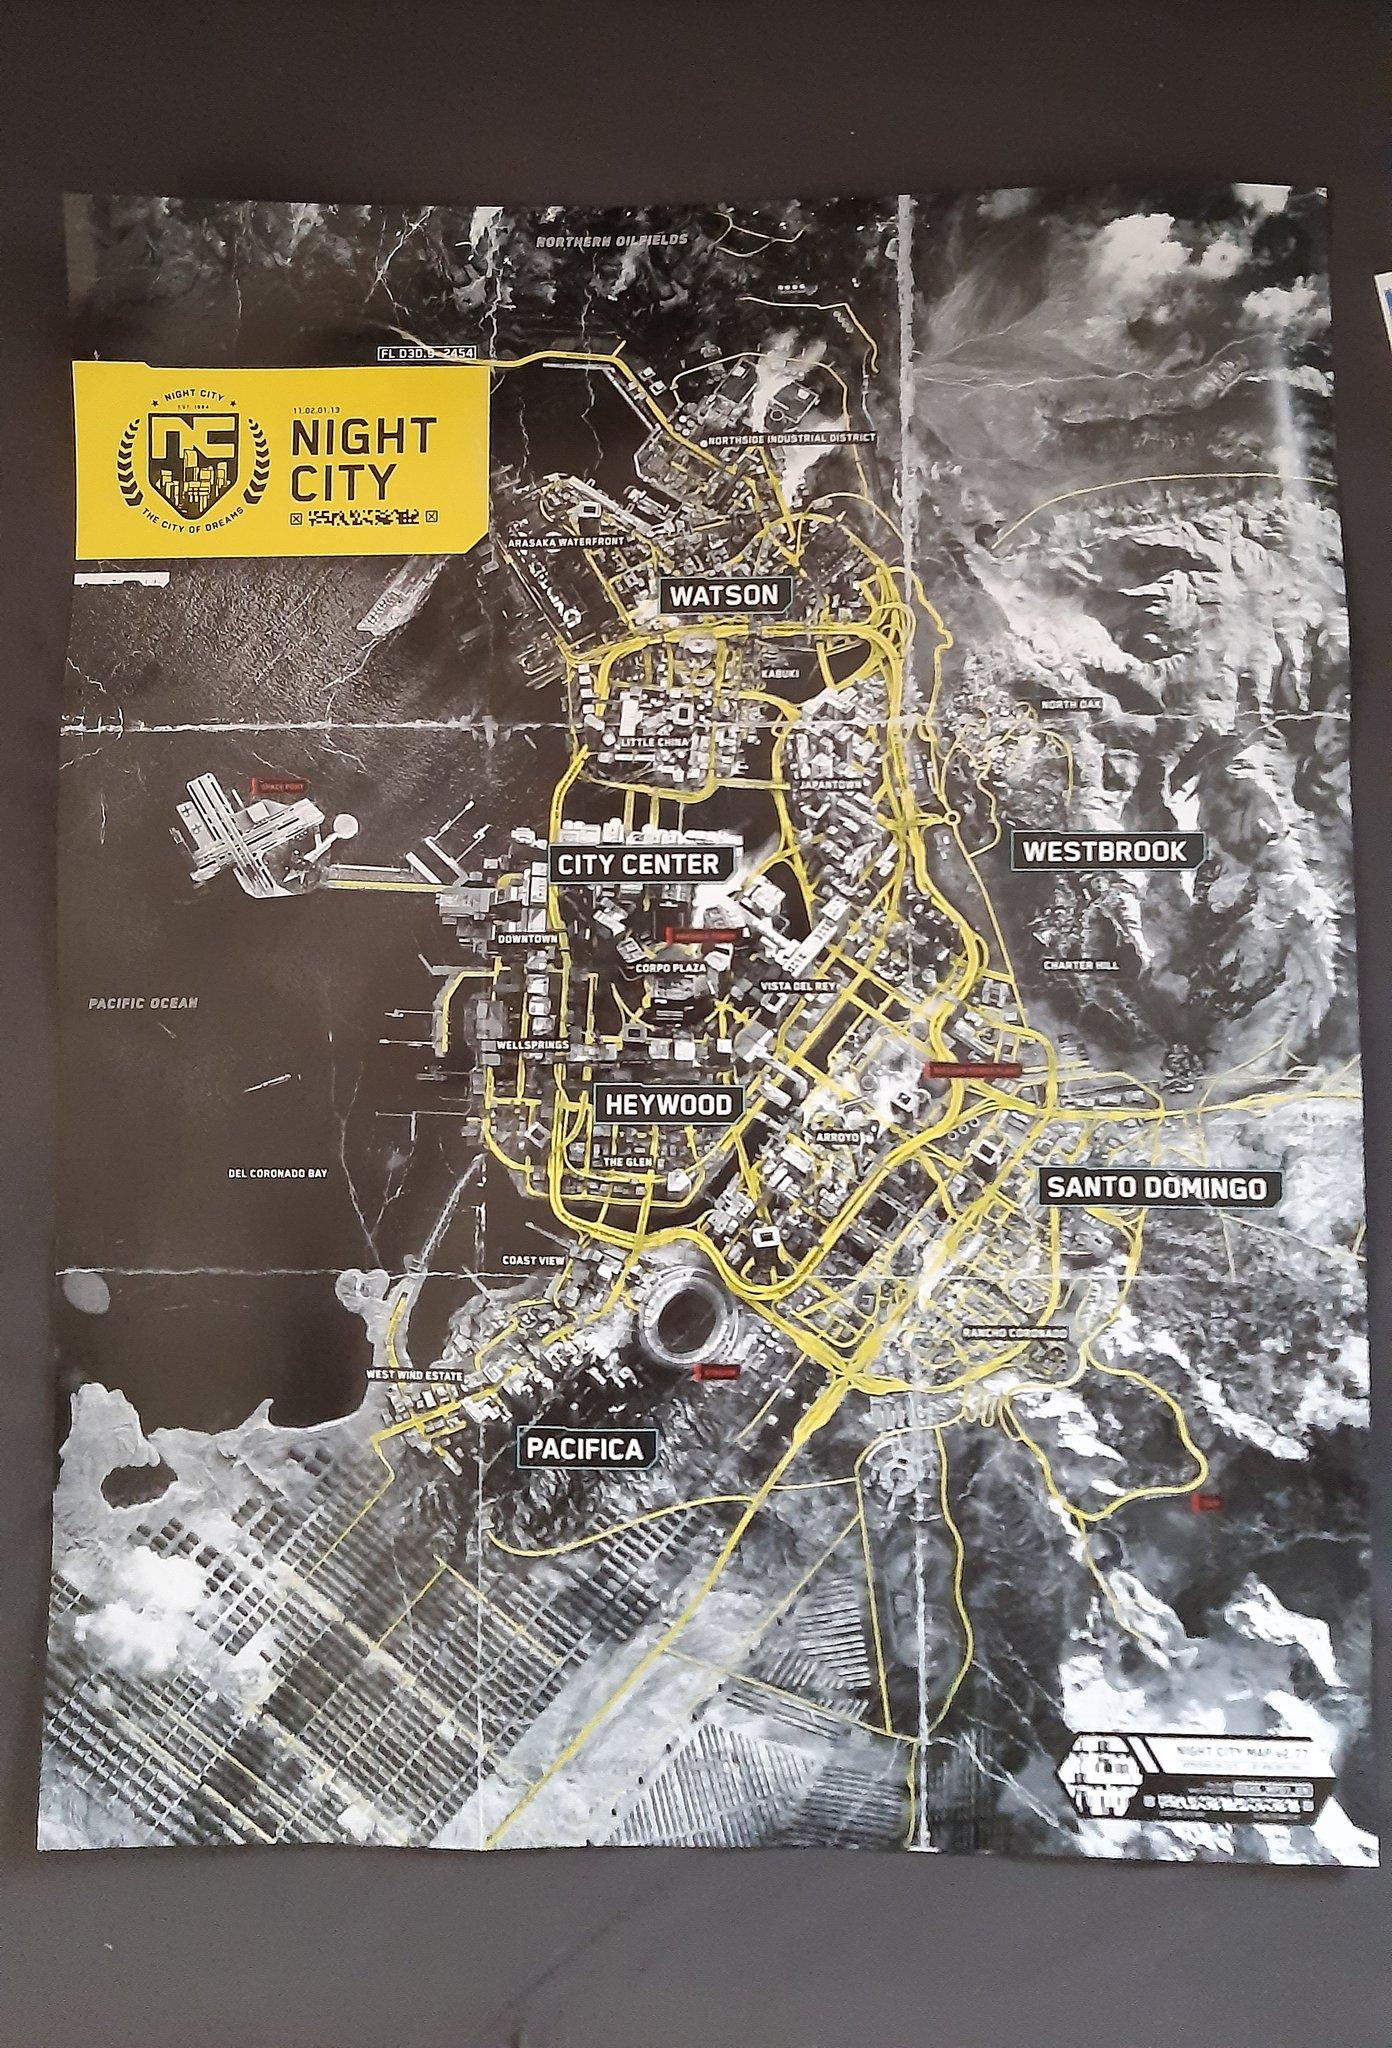 Cyberpunk 2077 CD Projekt Red خريطة